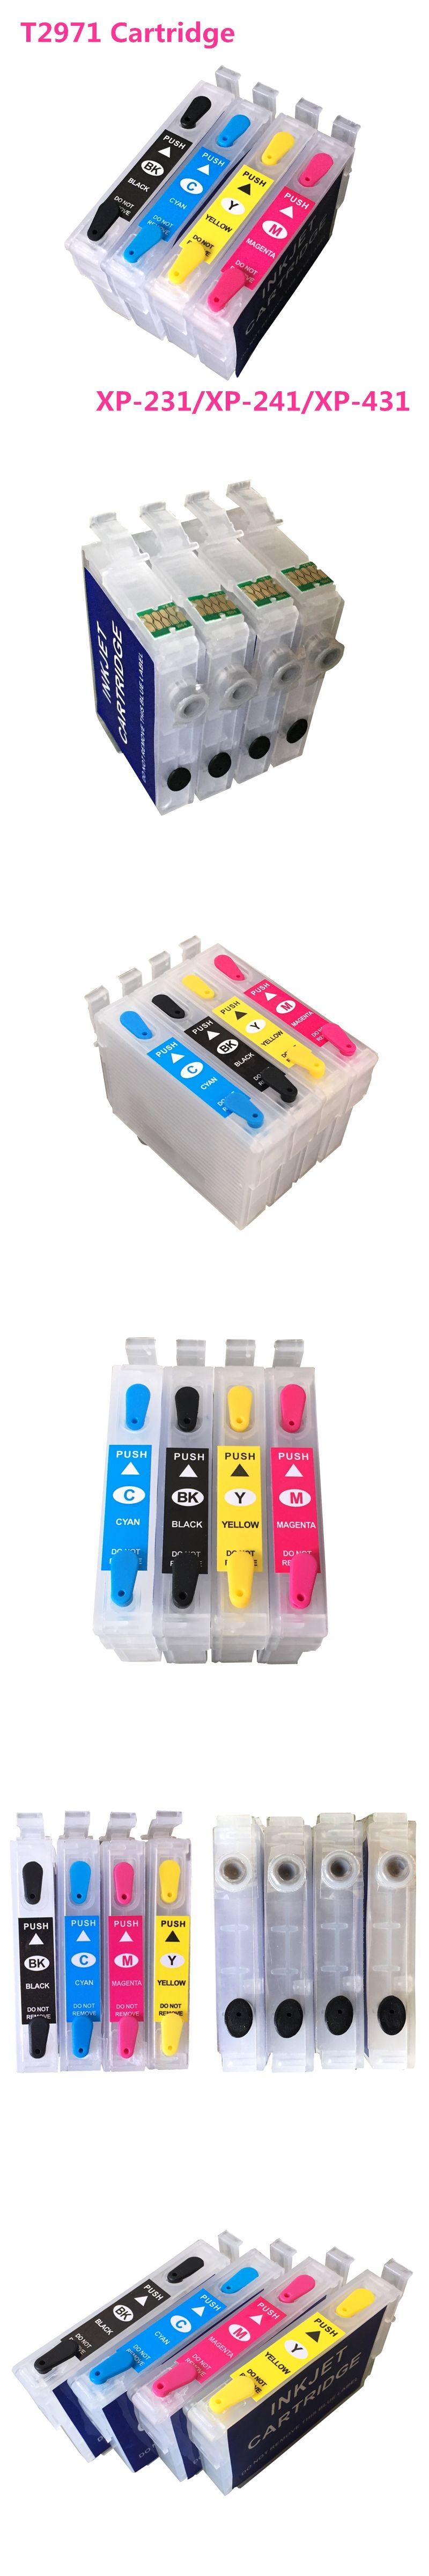 4 colors XP231 XP241 cartridge For Epson T2971 Refillable Ink Cartridge For Epson XP431 XP